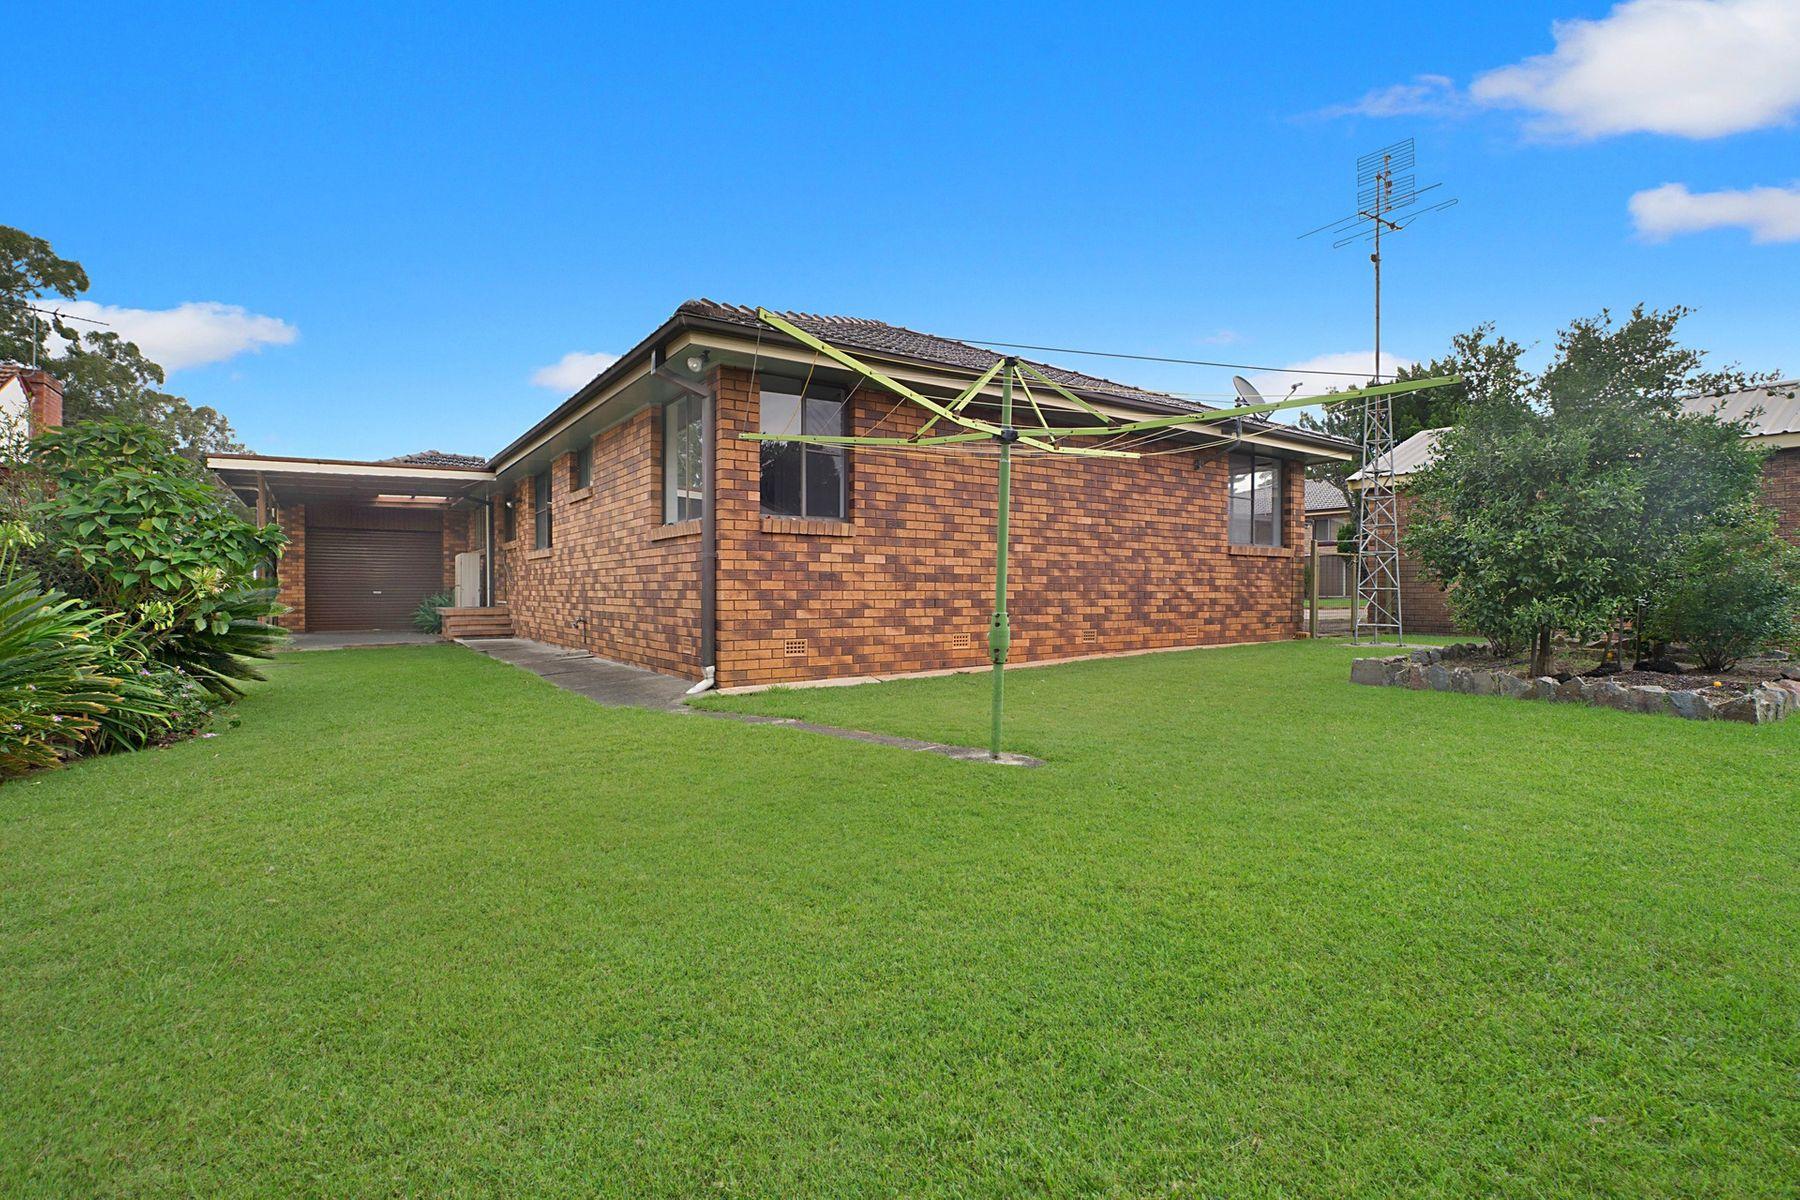 32 Long Crescent, Shortland, NSW 2307